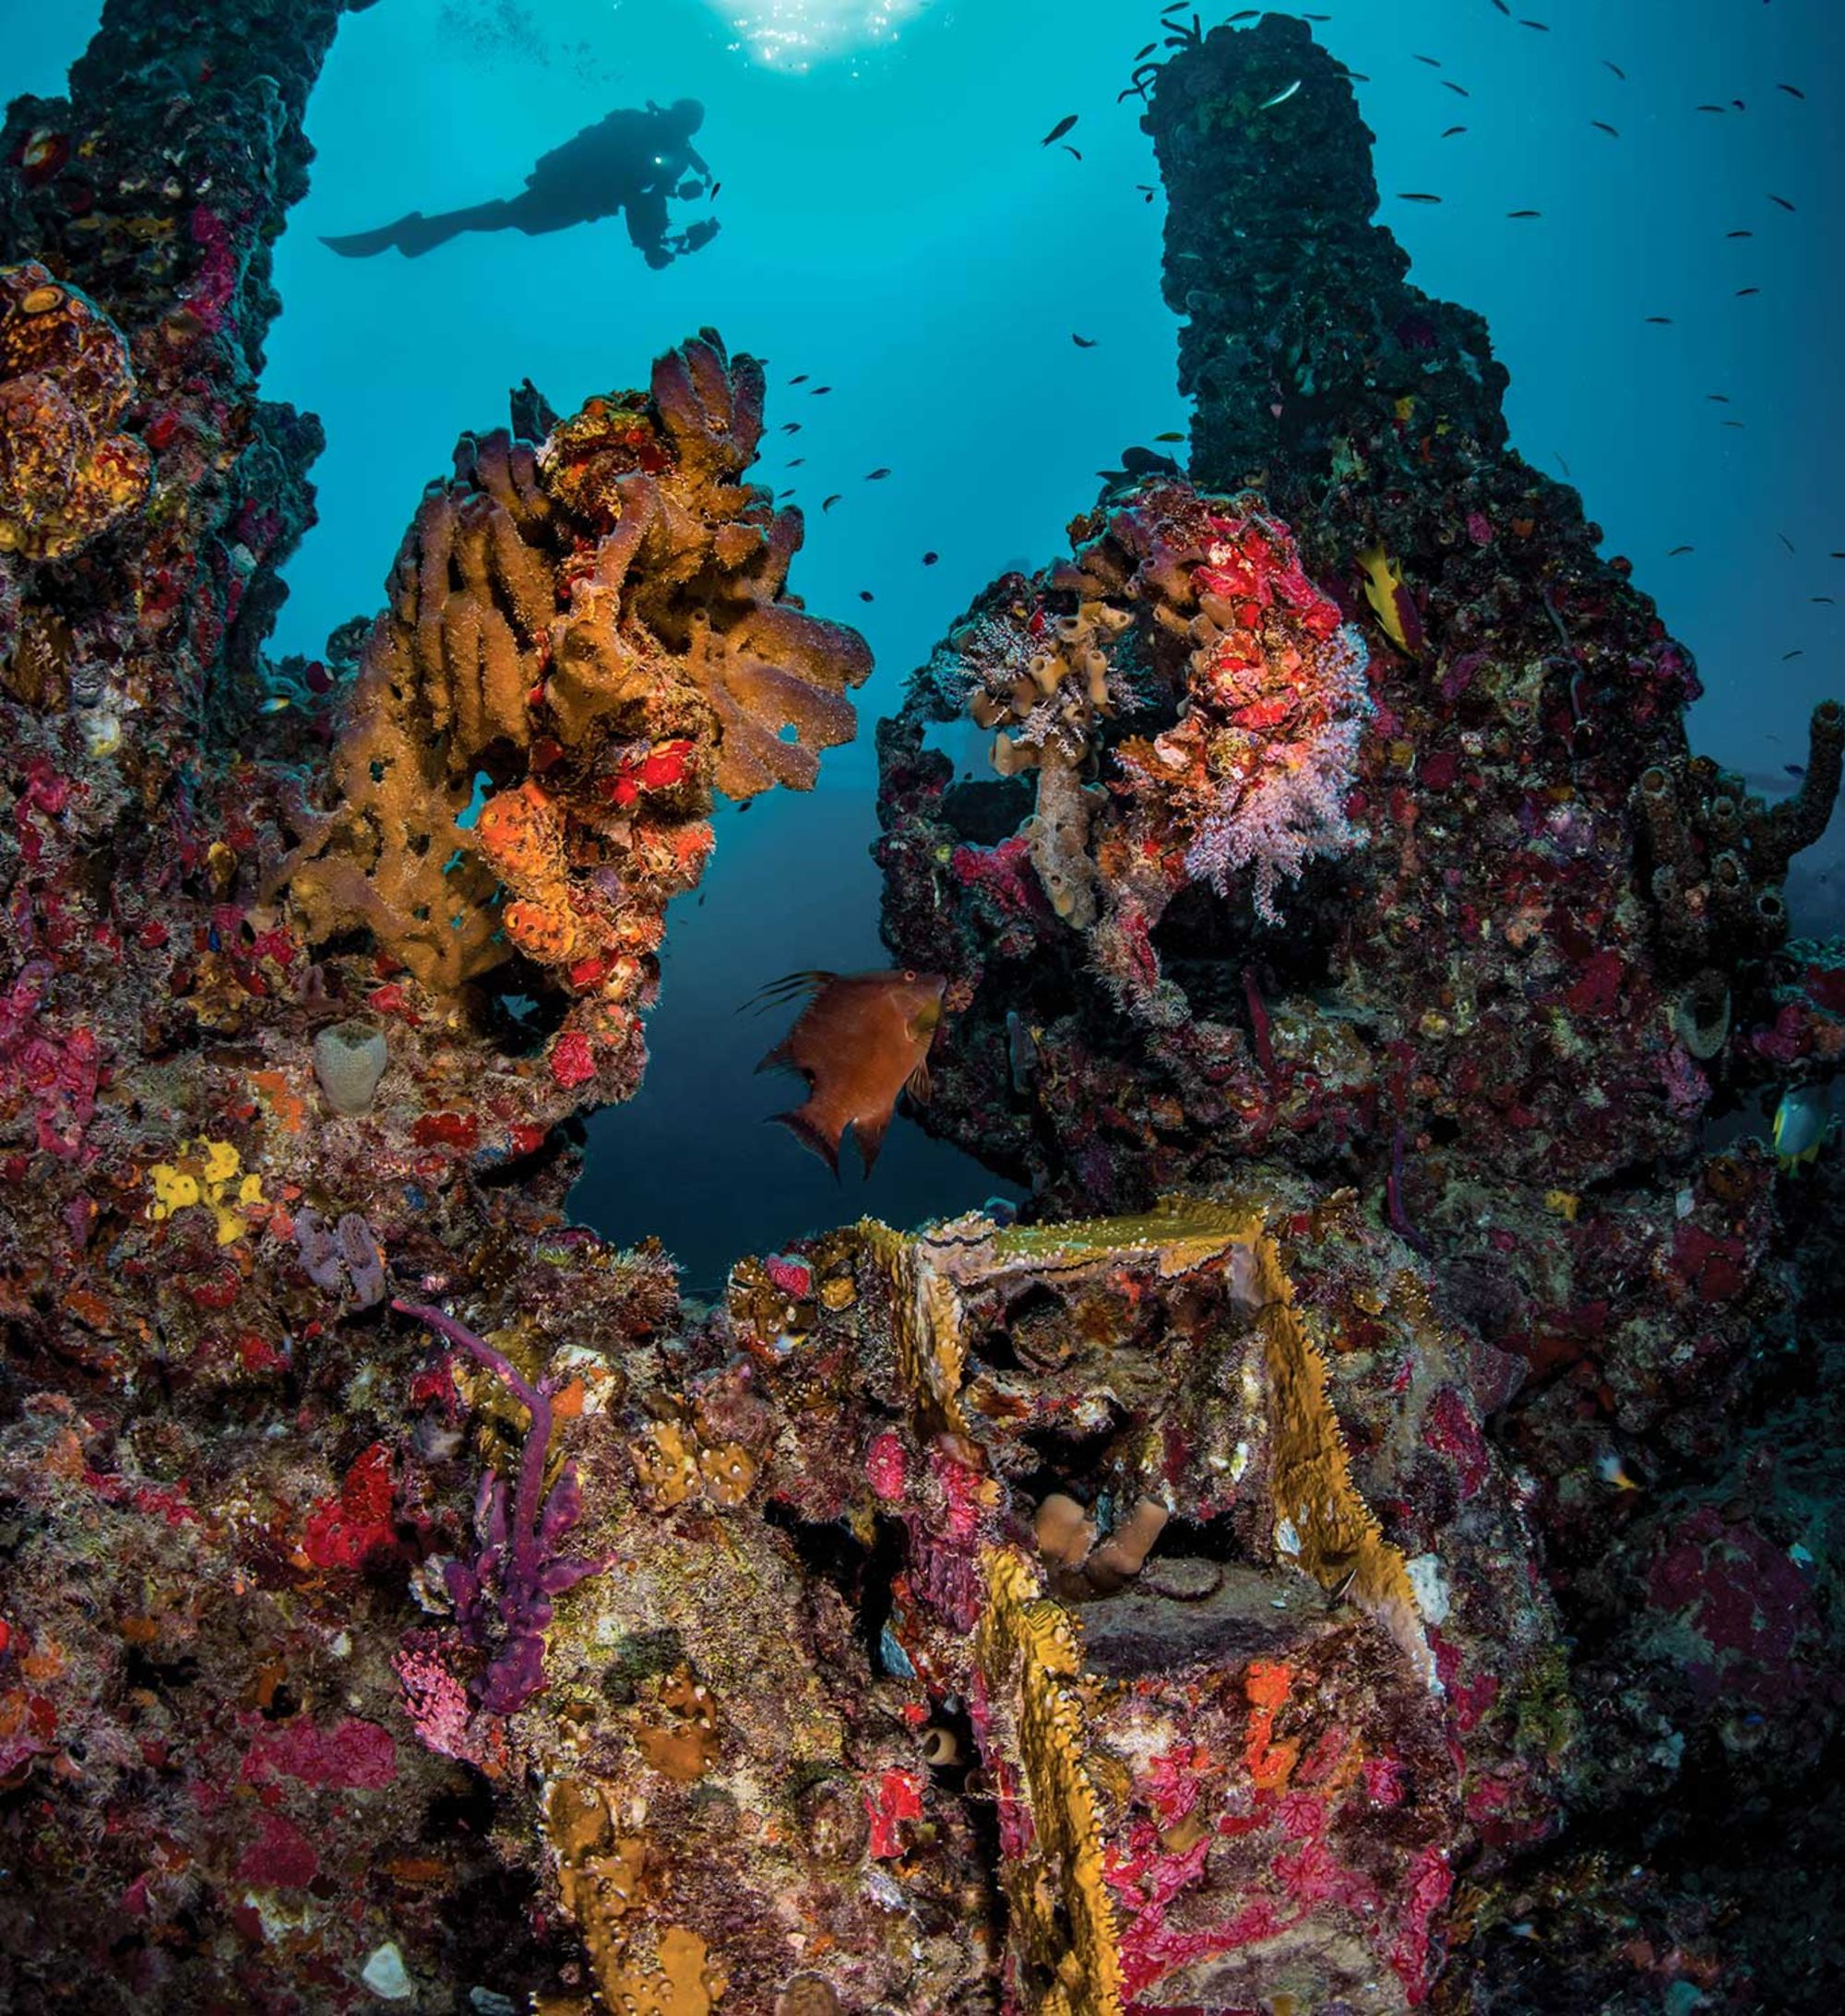 The PADI Wreck Diver Course